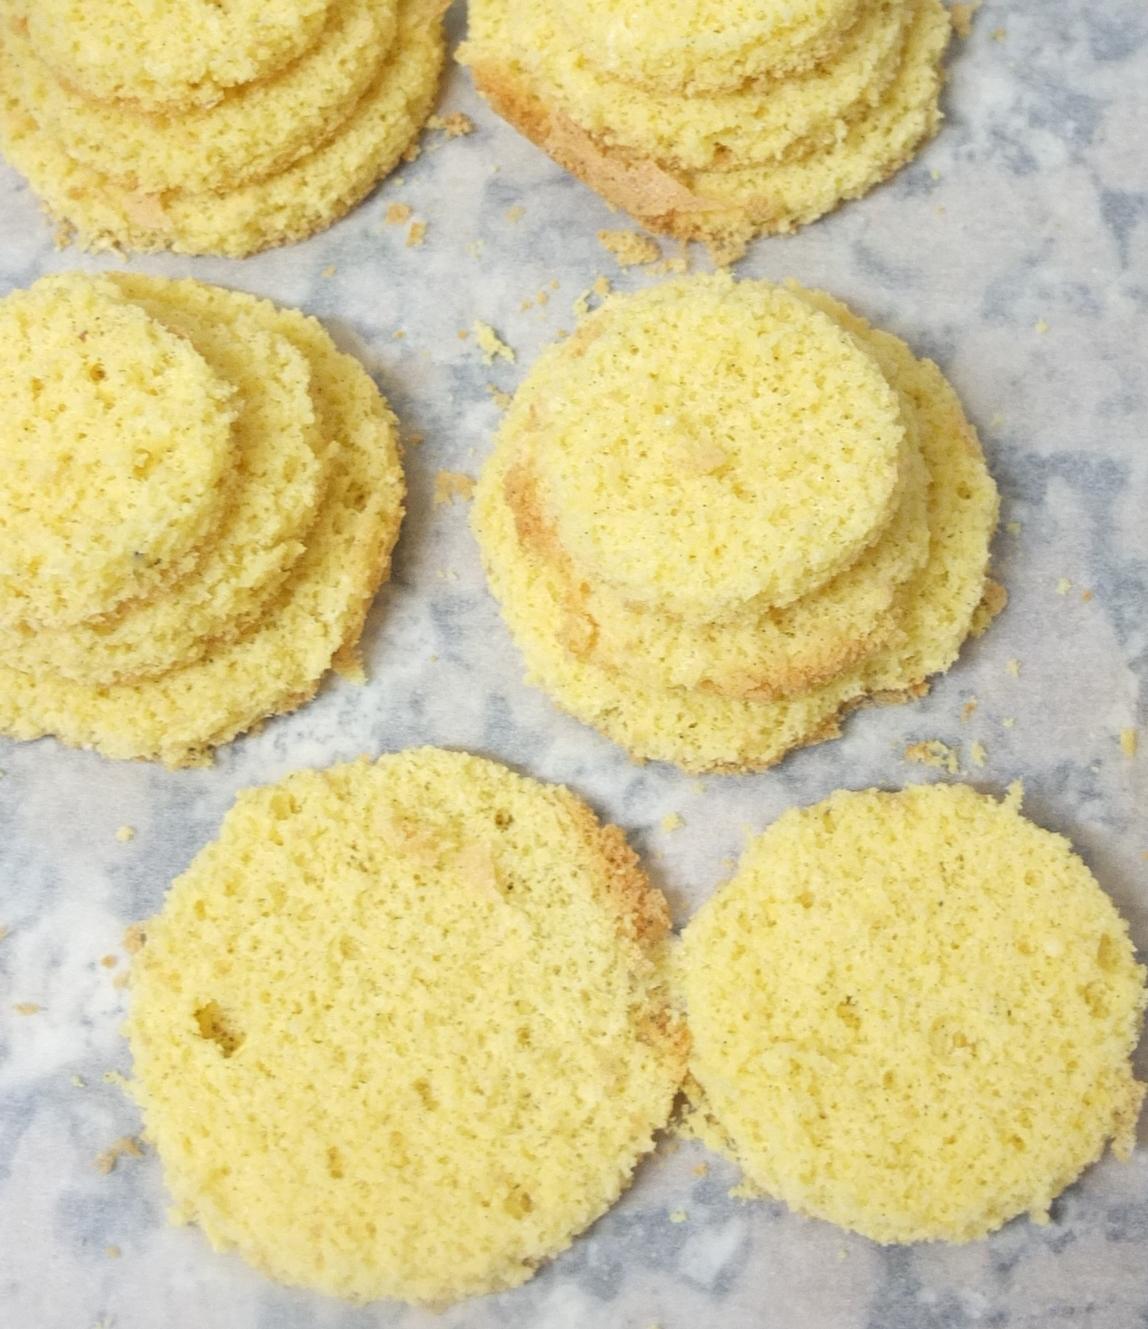 sugar-free genoise sponge